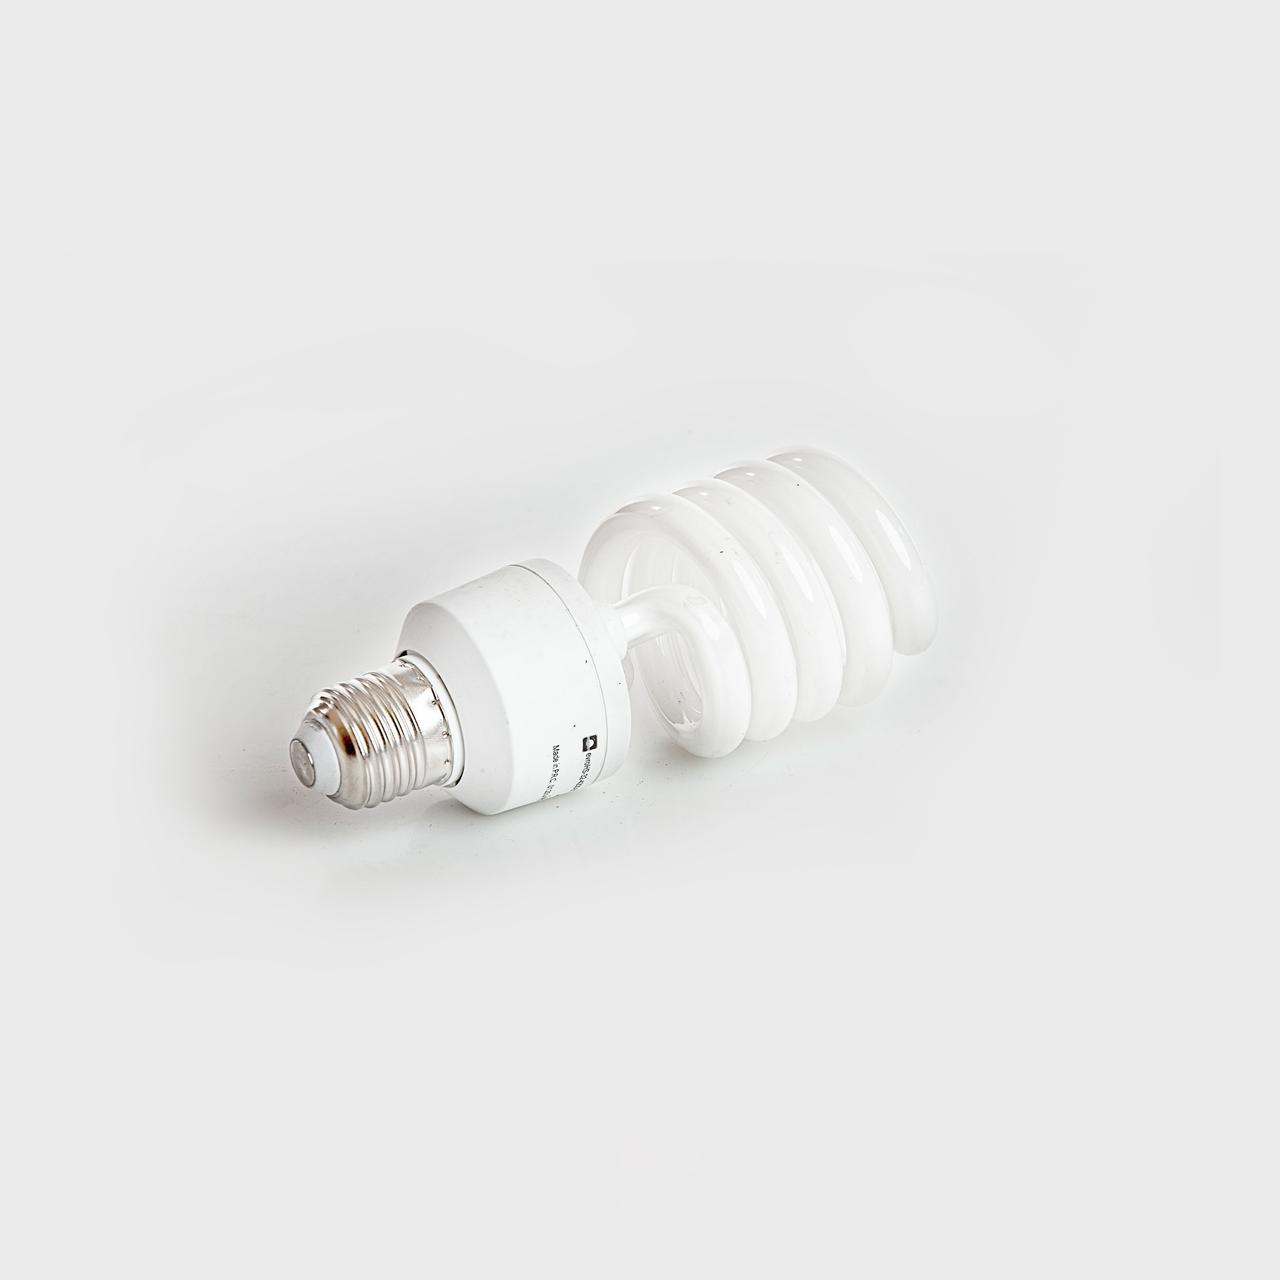 Лампа энергосберегающая 32W E27 4200K S-32-4200-27